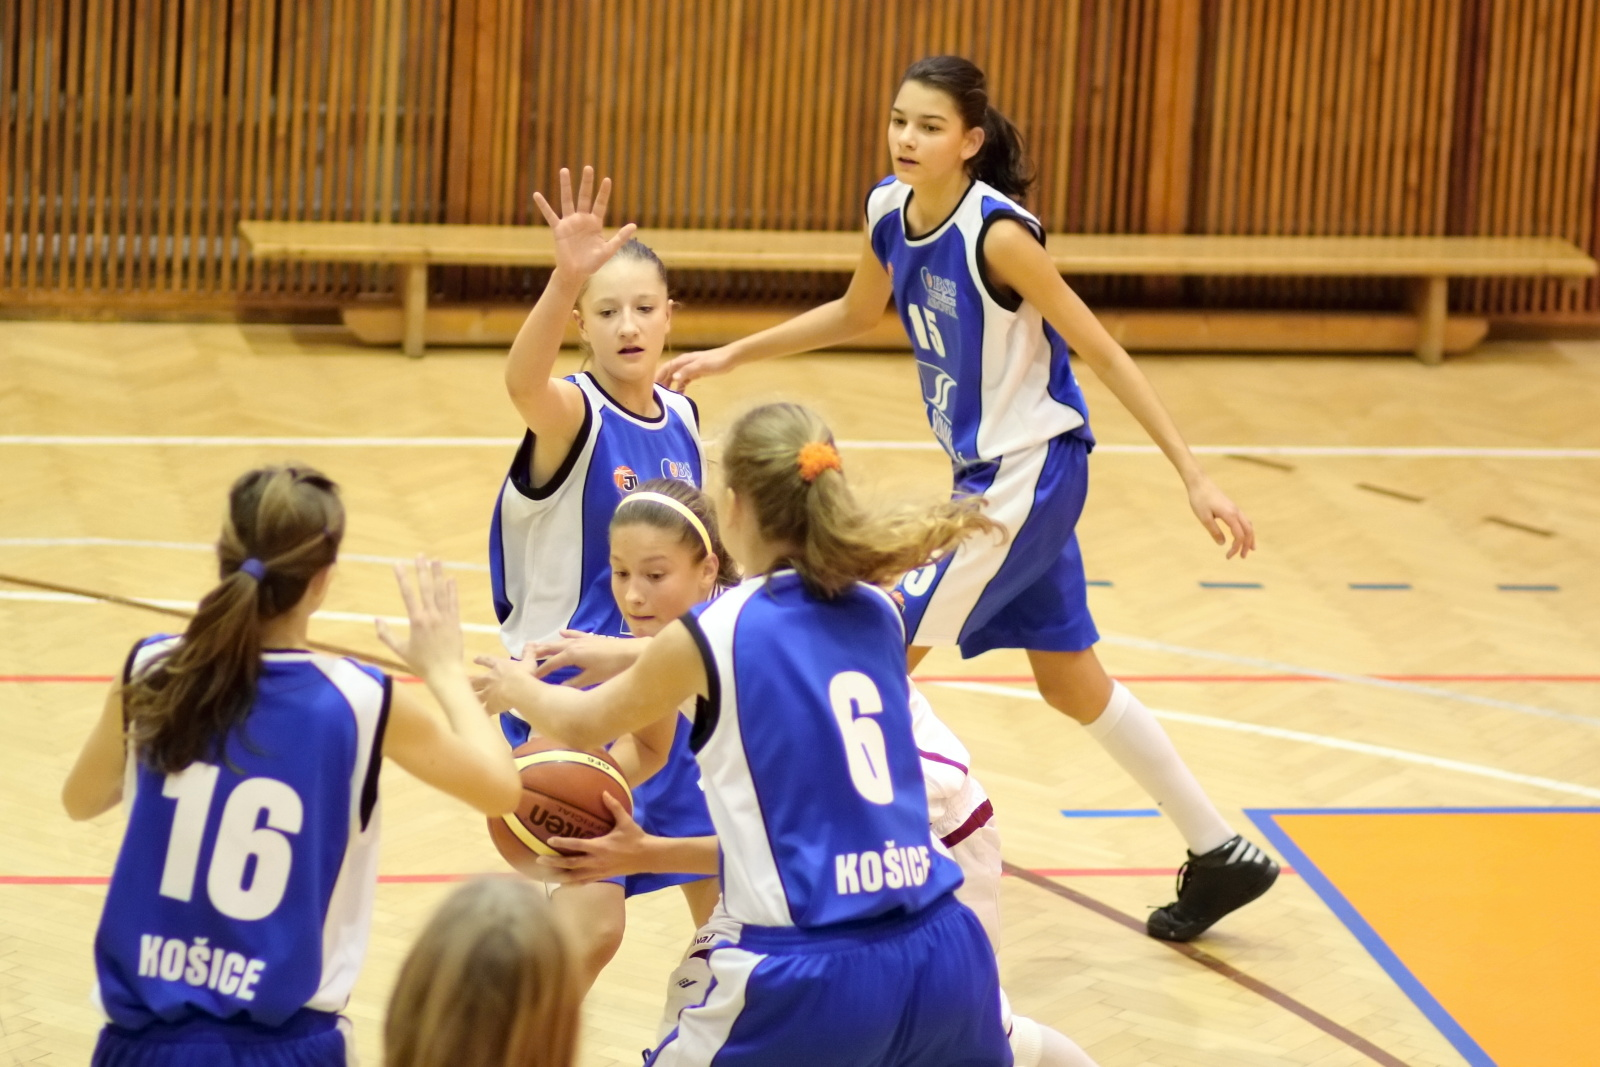 bk-zvolen-abovia-kosice-ziacky-basketbal-2011-20